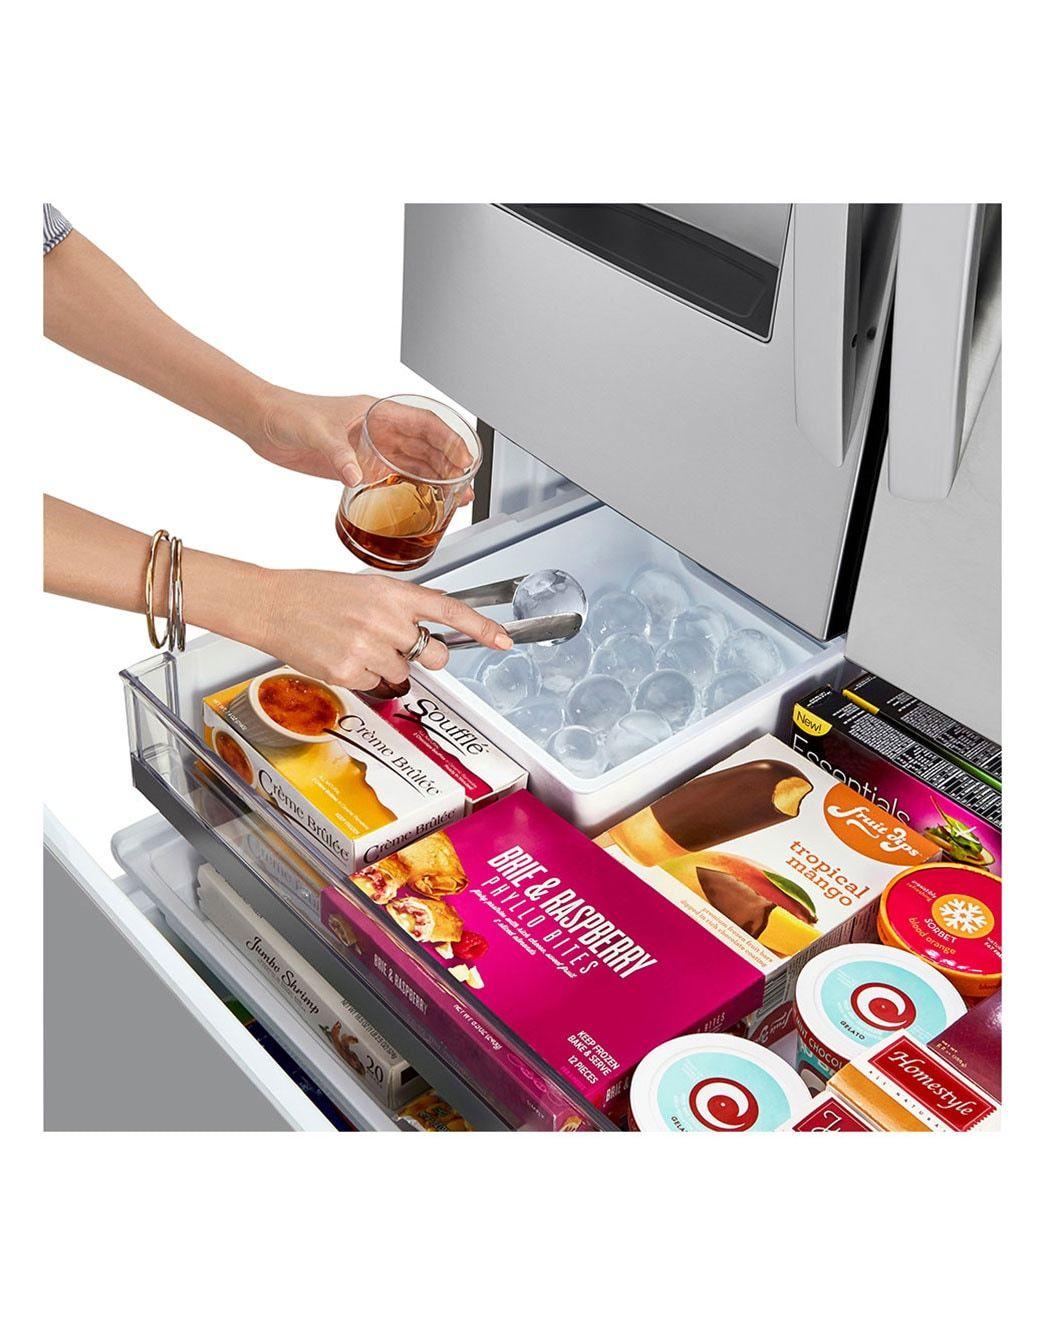 15+ Lg fridge craft ice review ideas